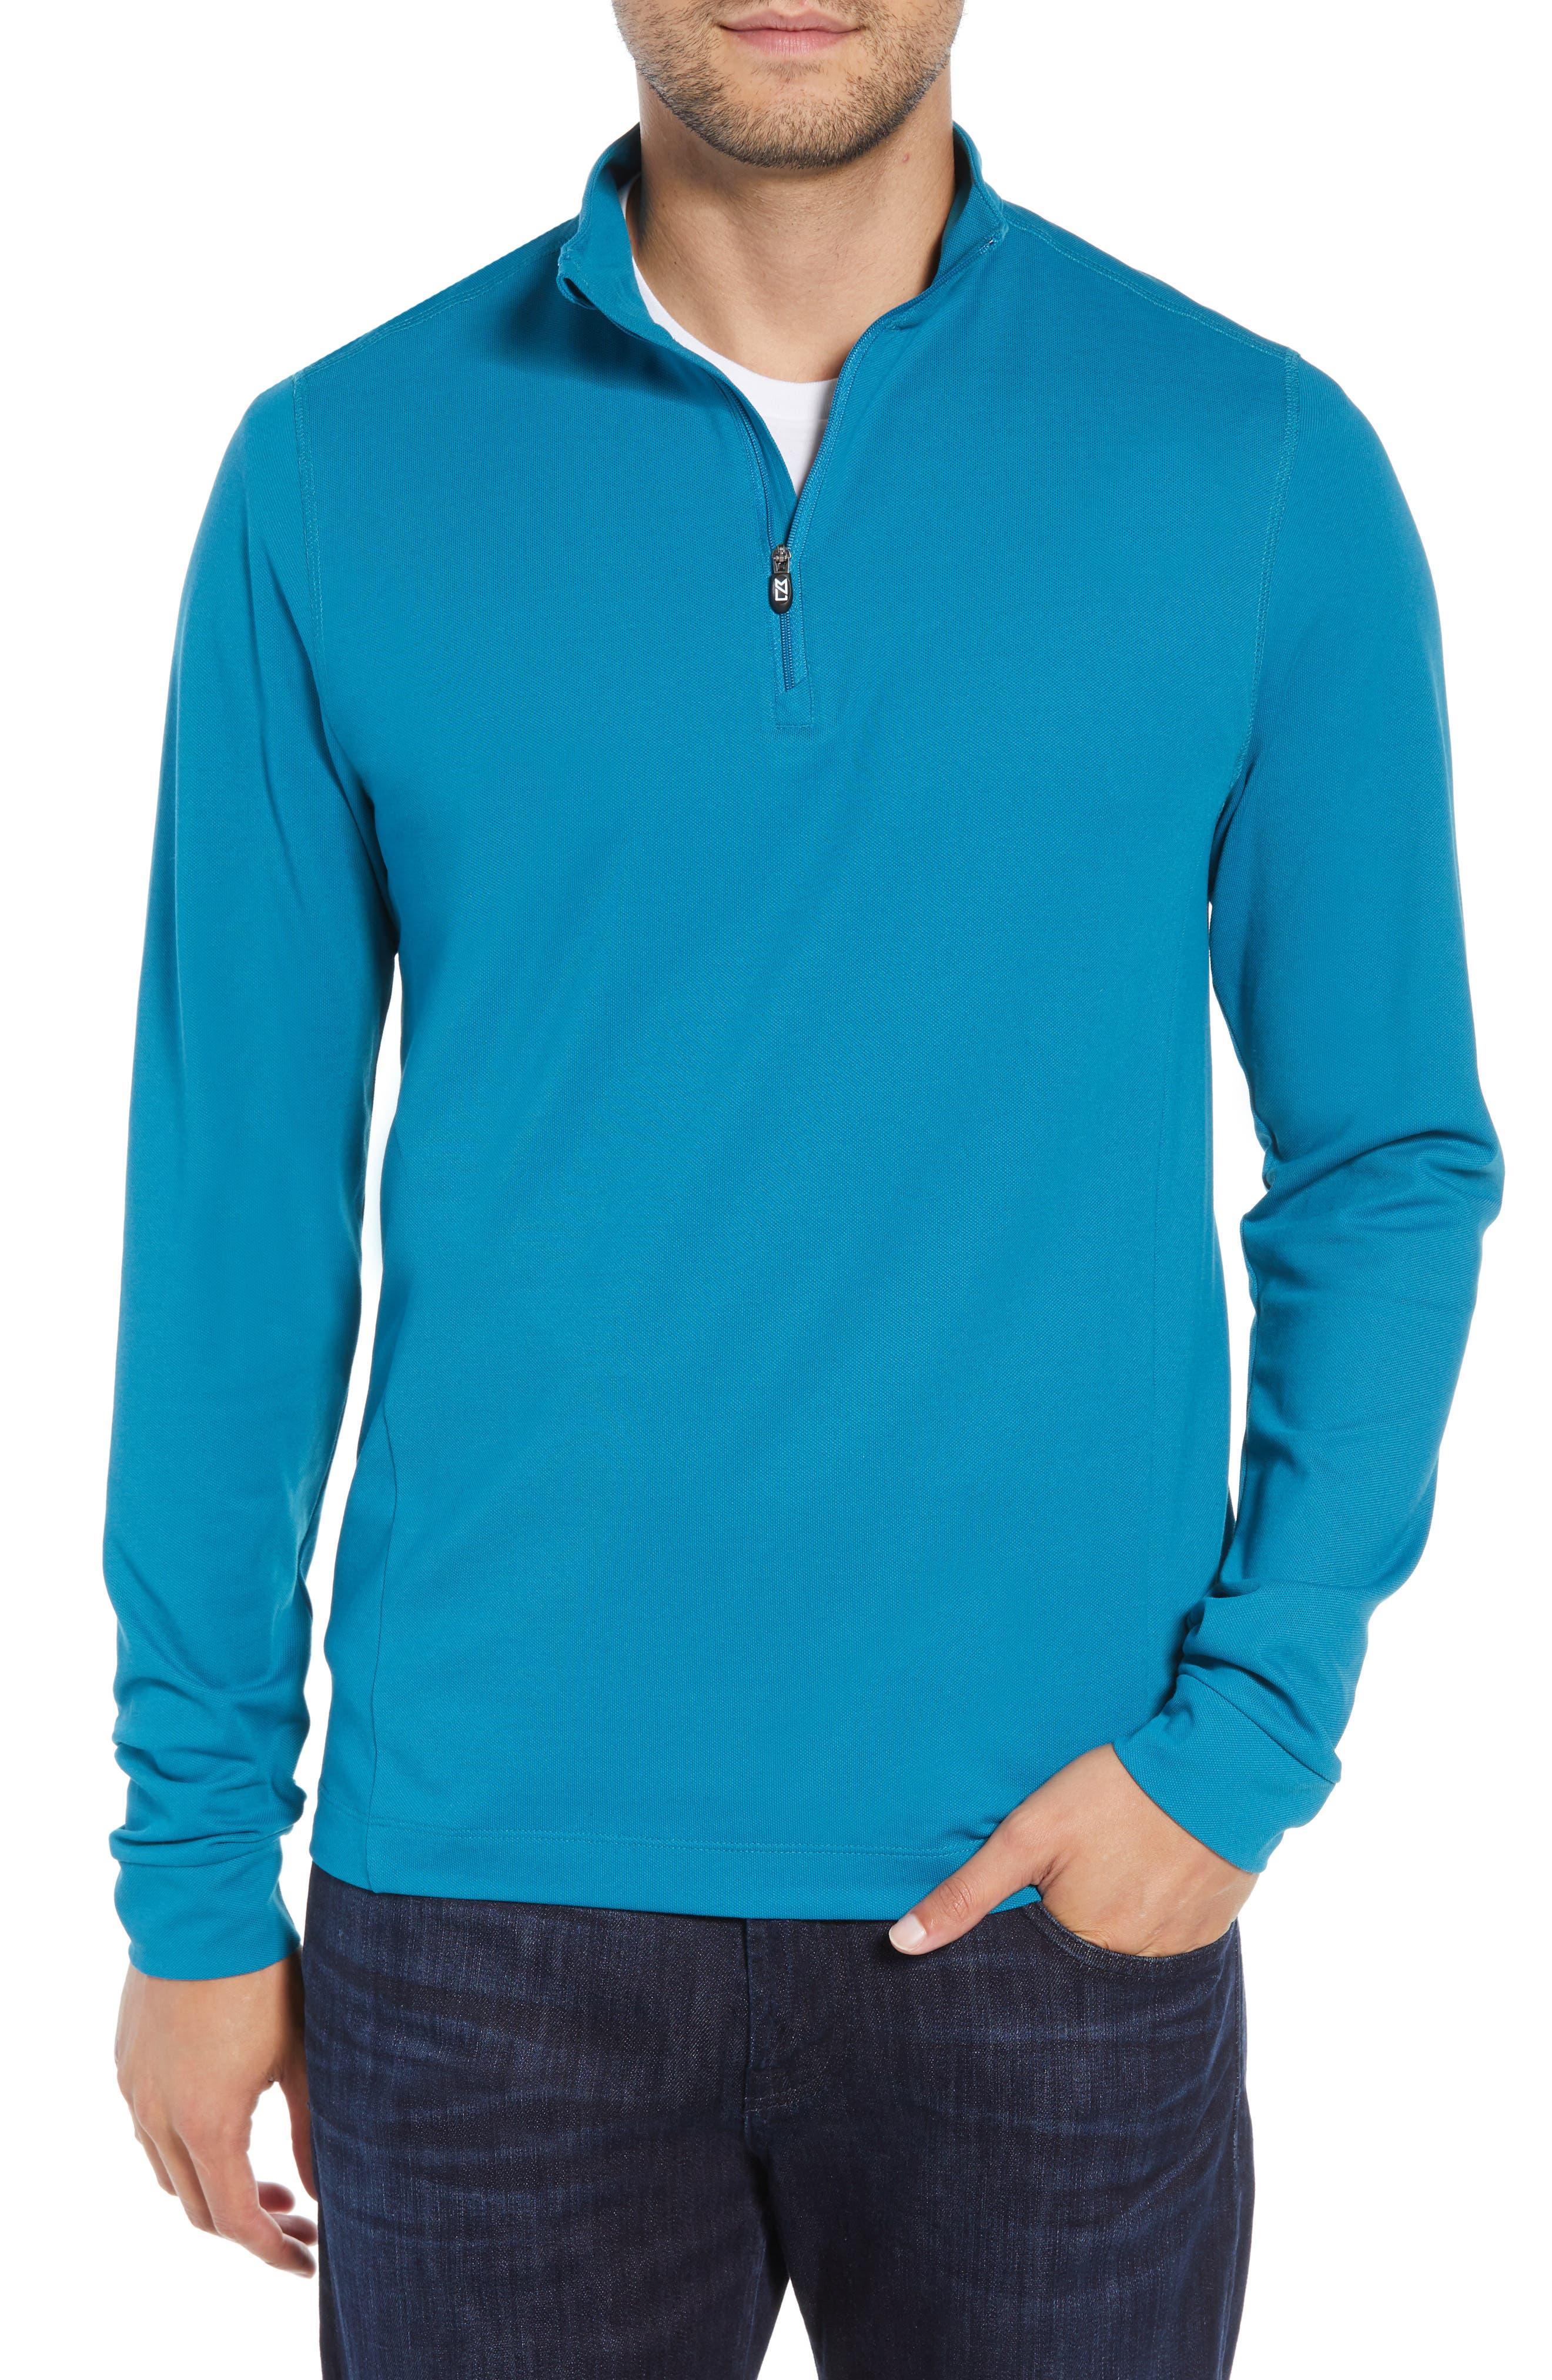 CUTTER & BUCK, Advantage Regular Fit DryTec Mock Neck Pullover, Main thumbnail 1, color, TEAL BLUE